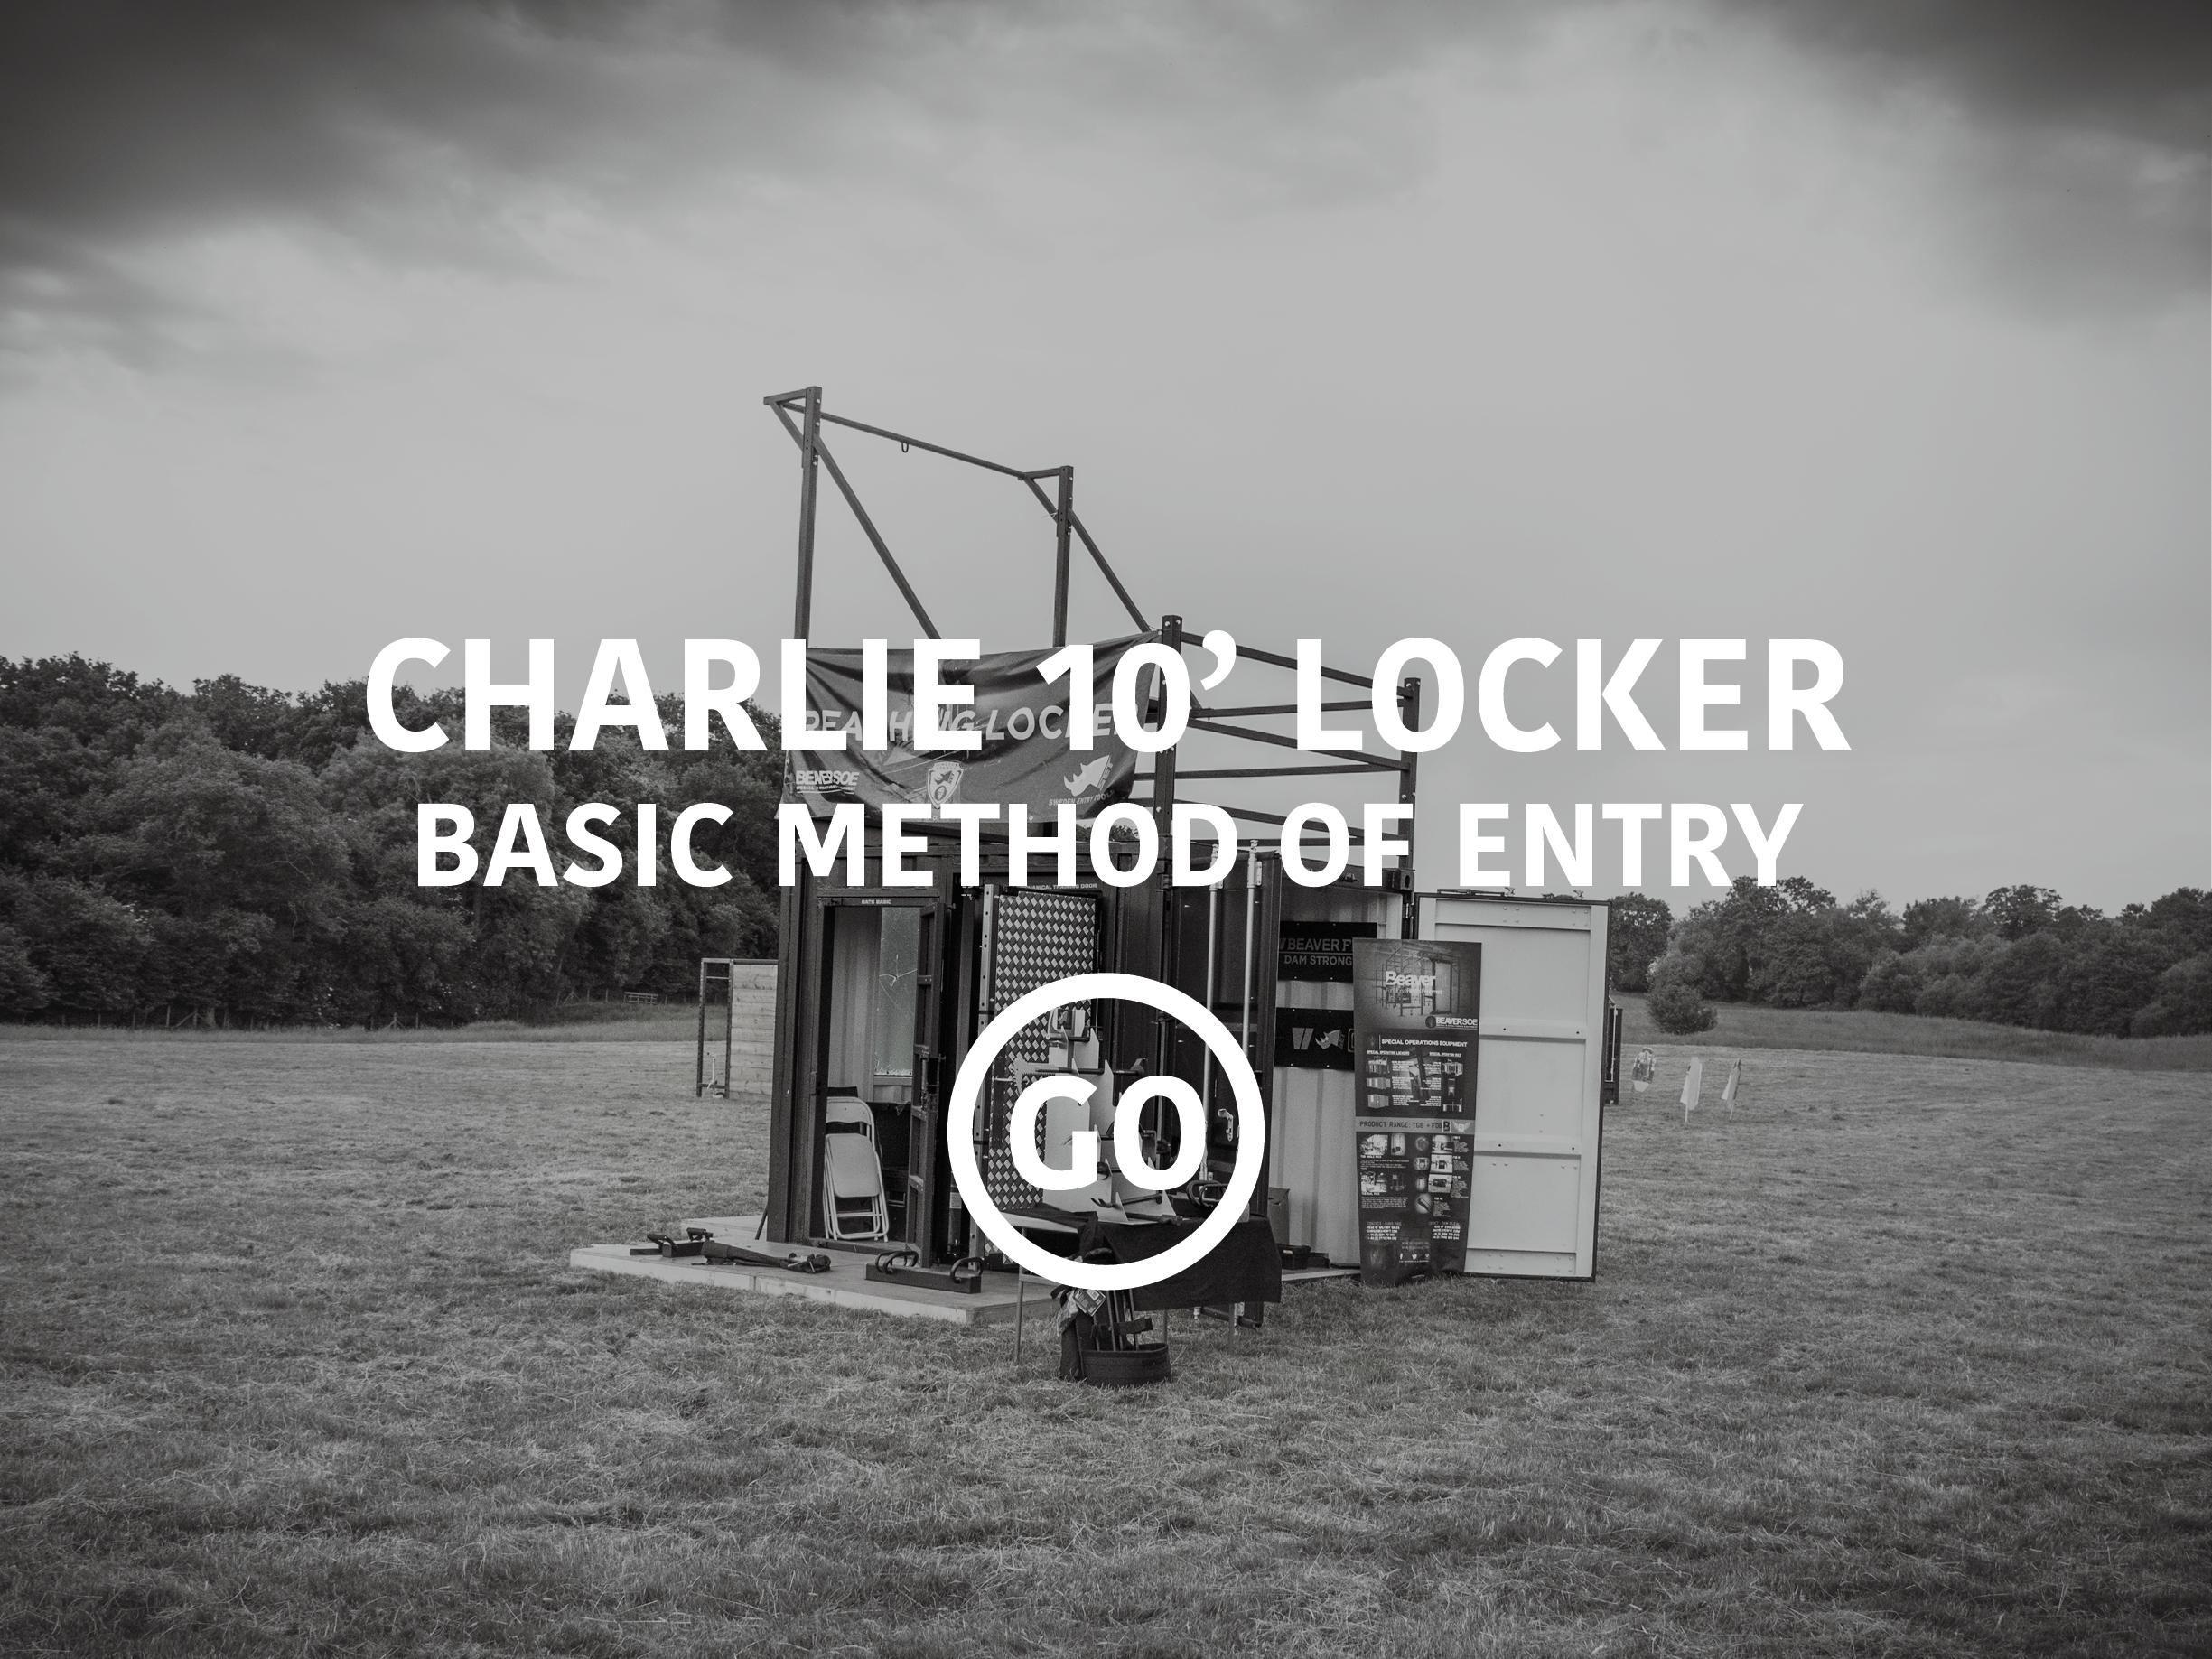 Charlie 10'Locker Basic Breaching Small Box